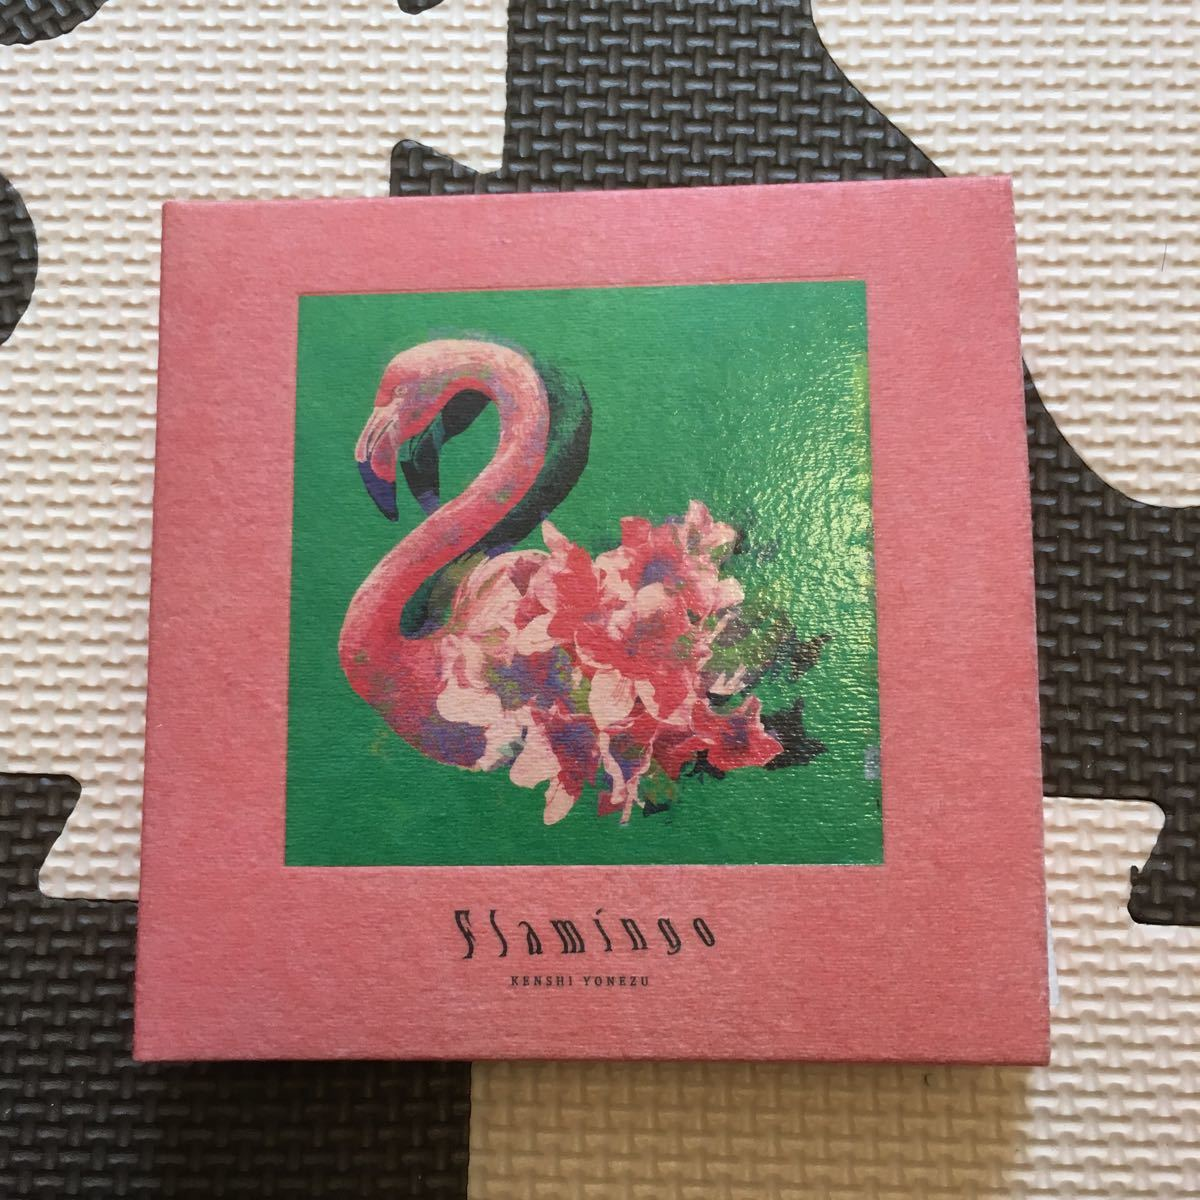 米津玄師 「flamingo」